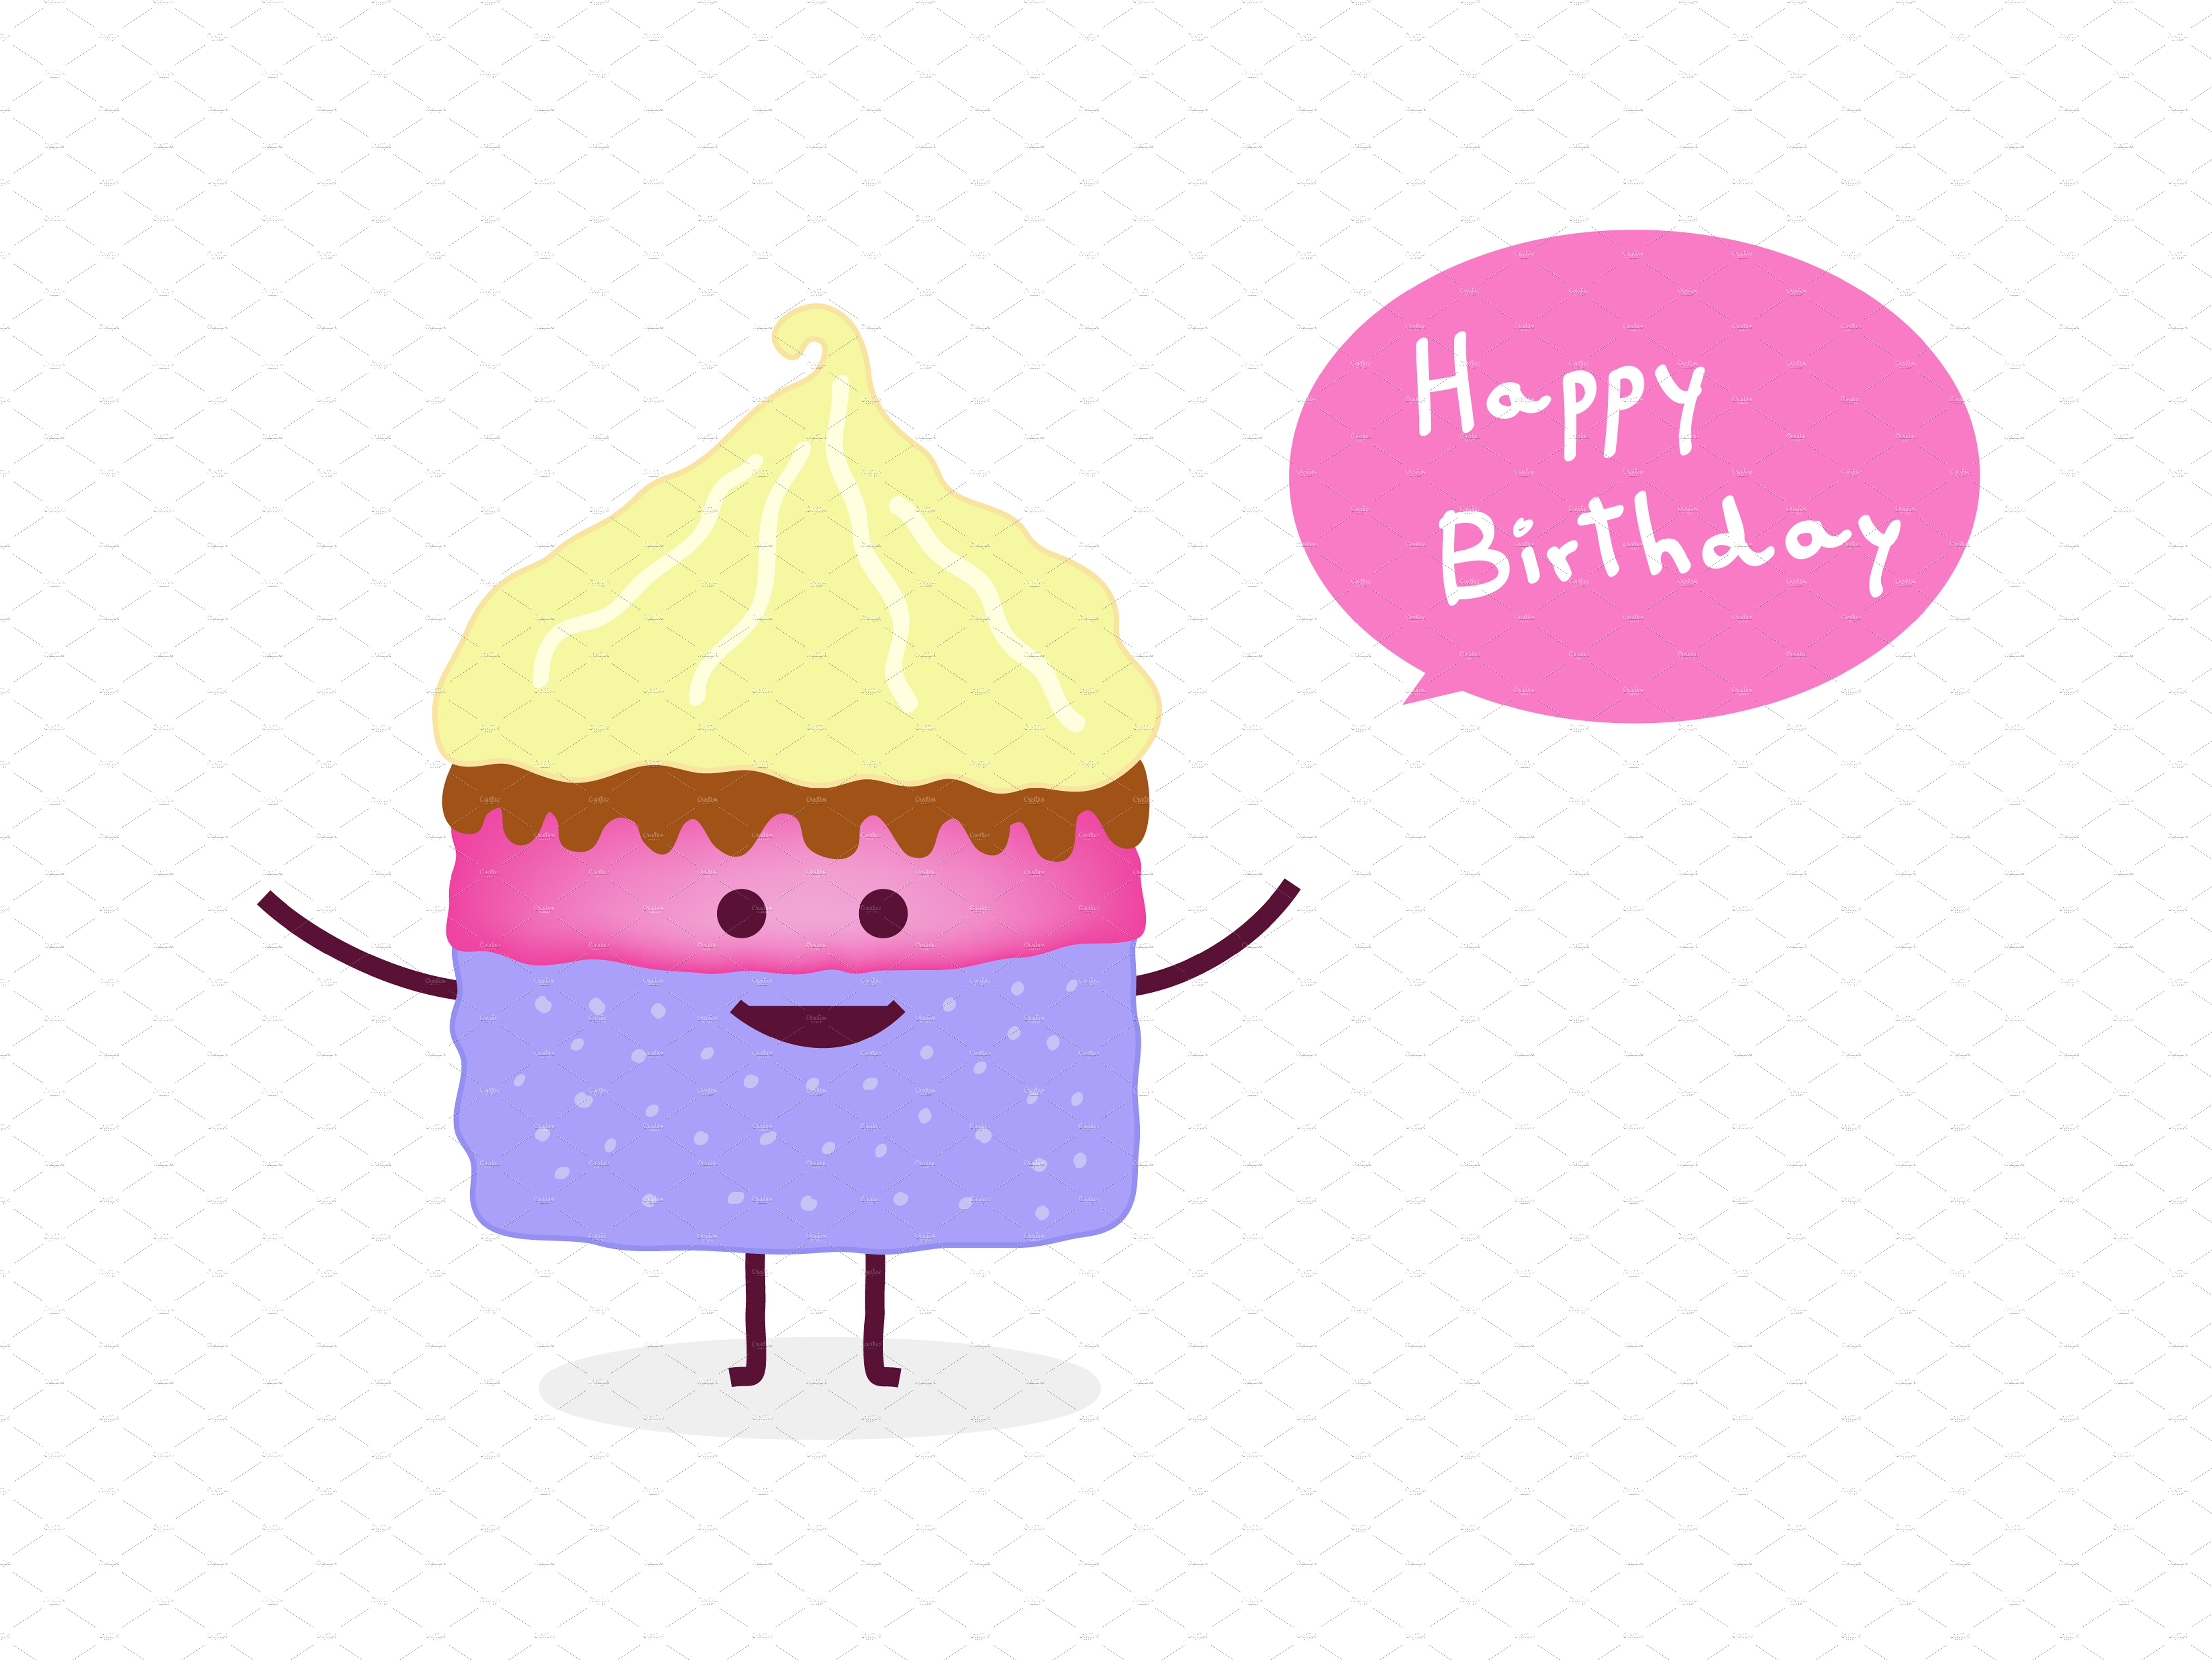 Happy birthday cake ~ Illustrations ~ Creative Market